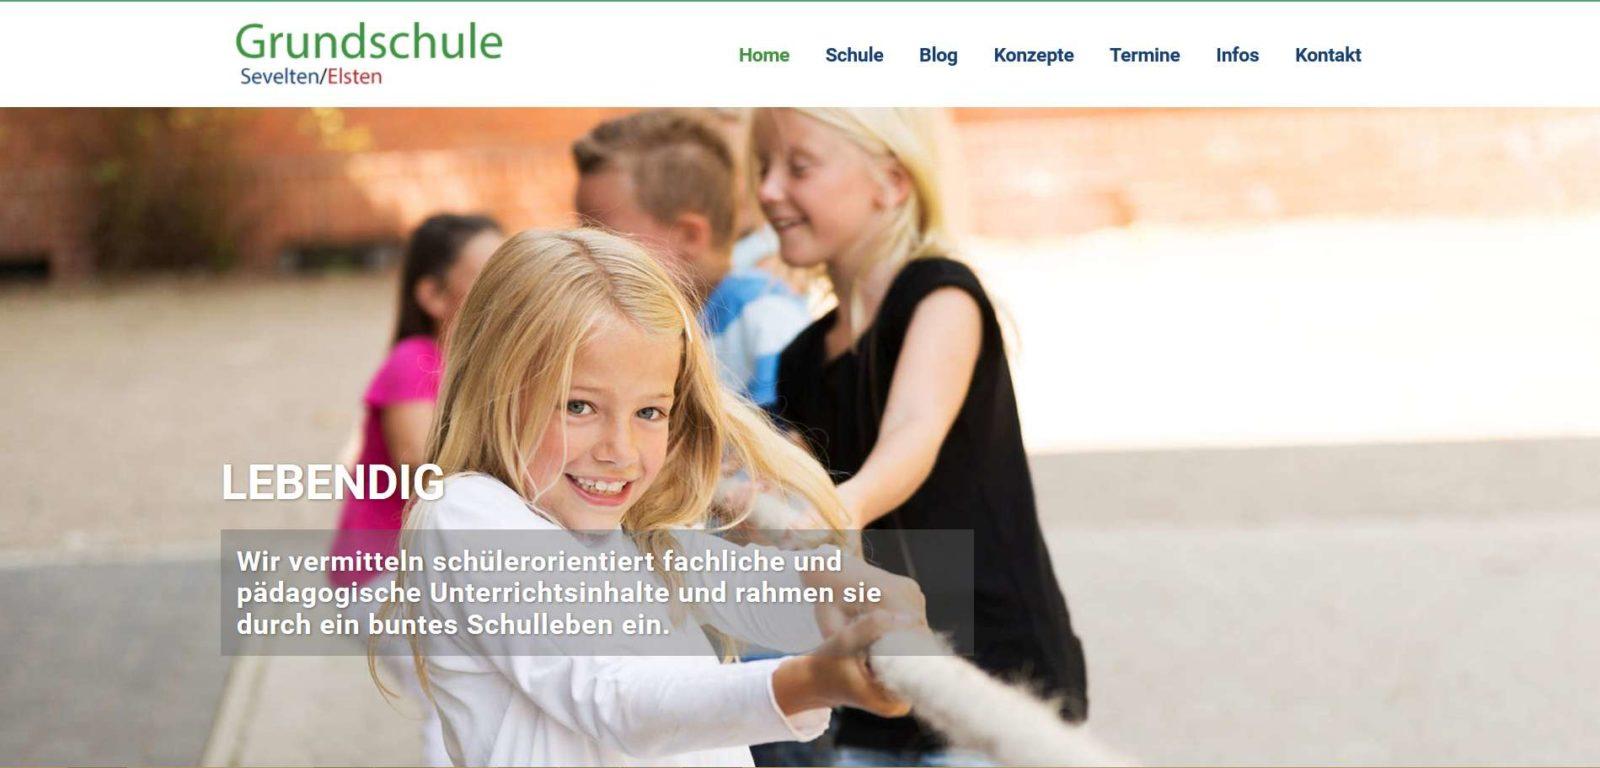 Grundschule Sevelten - Elsten